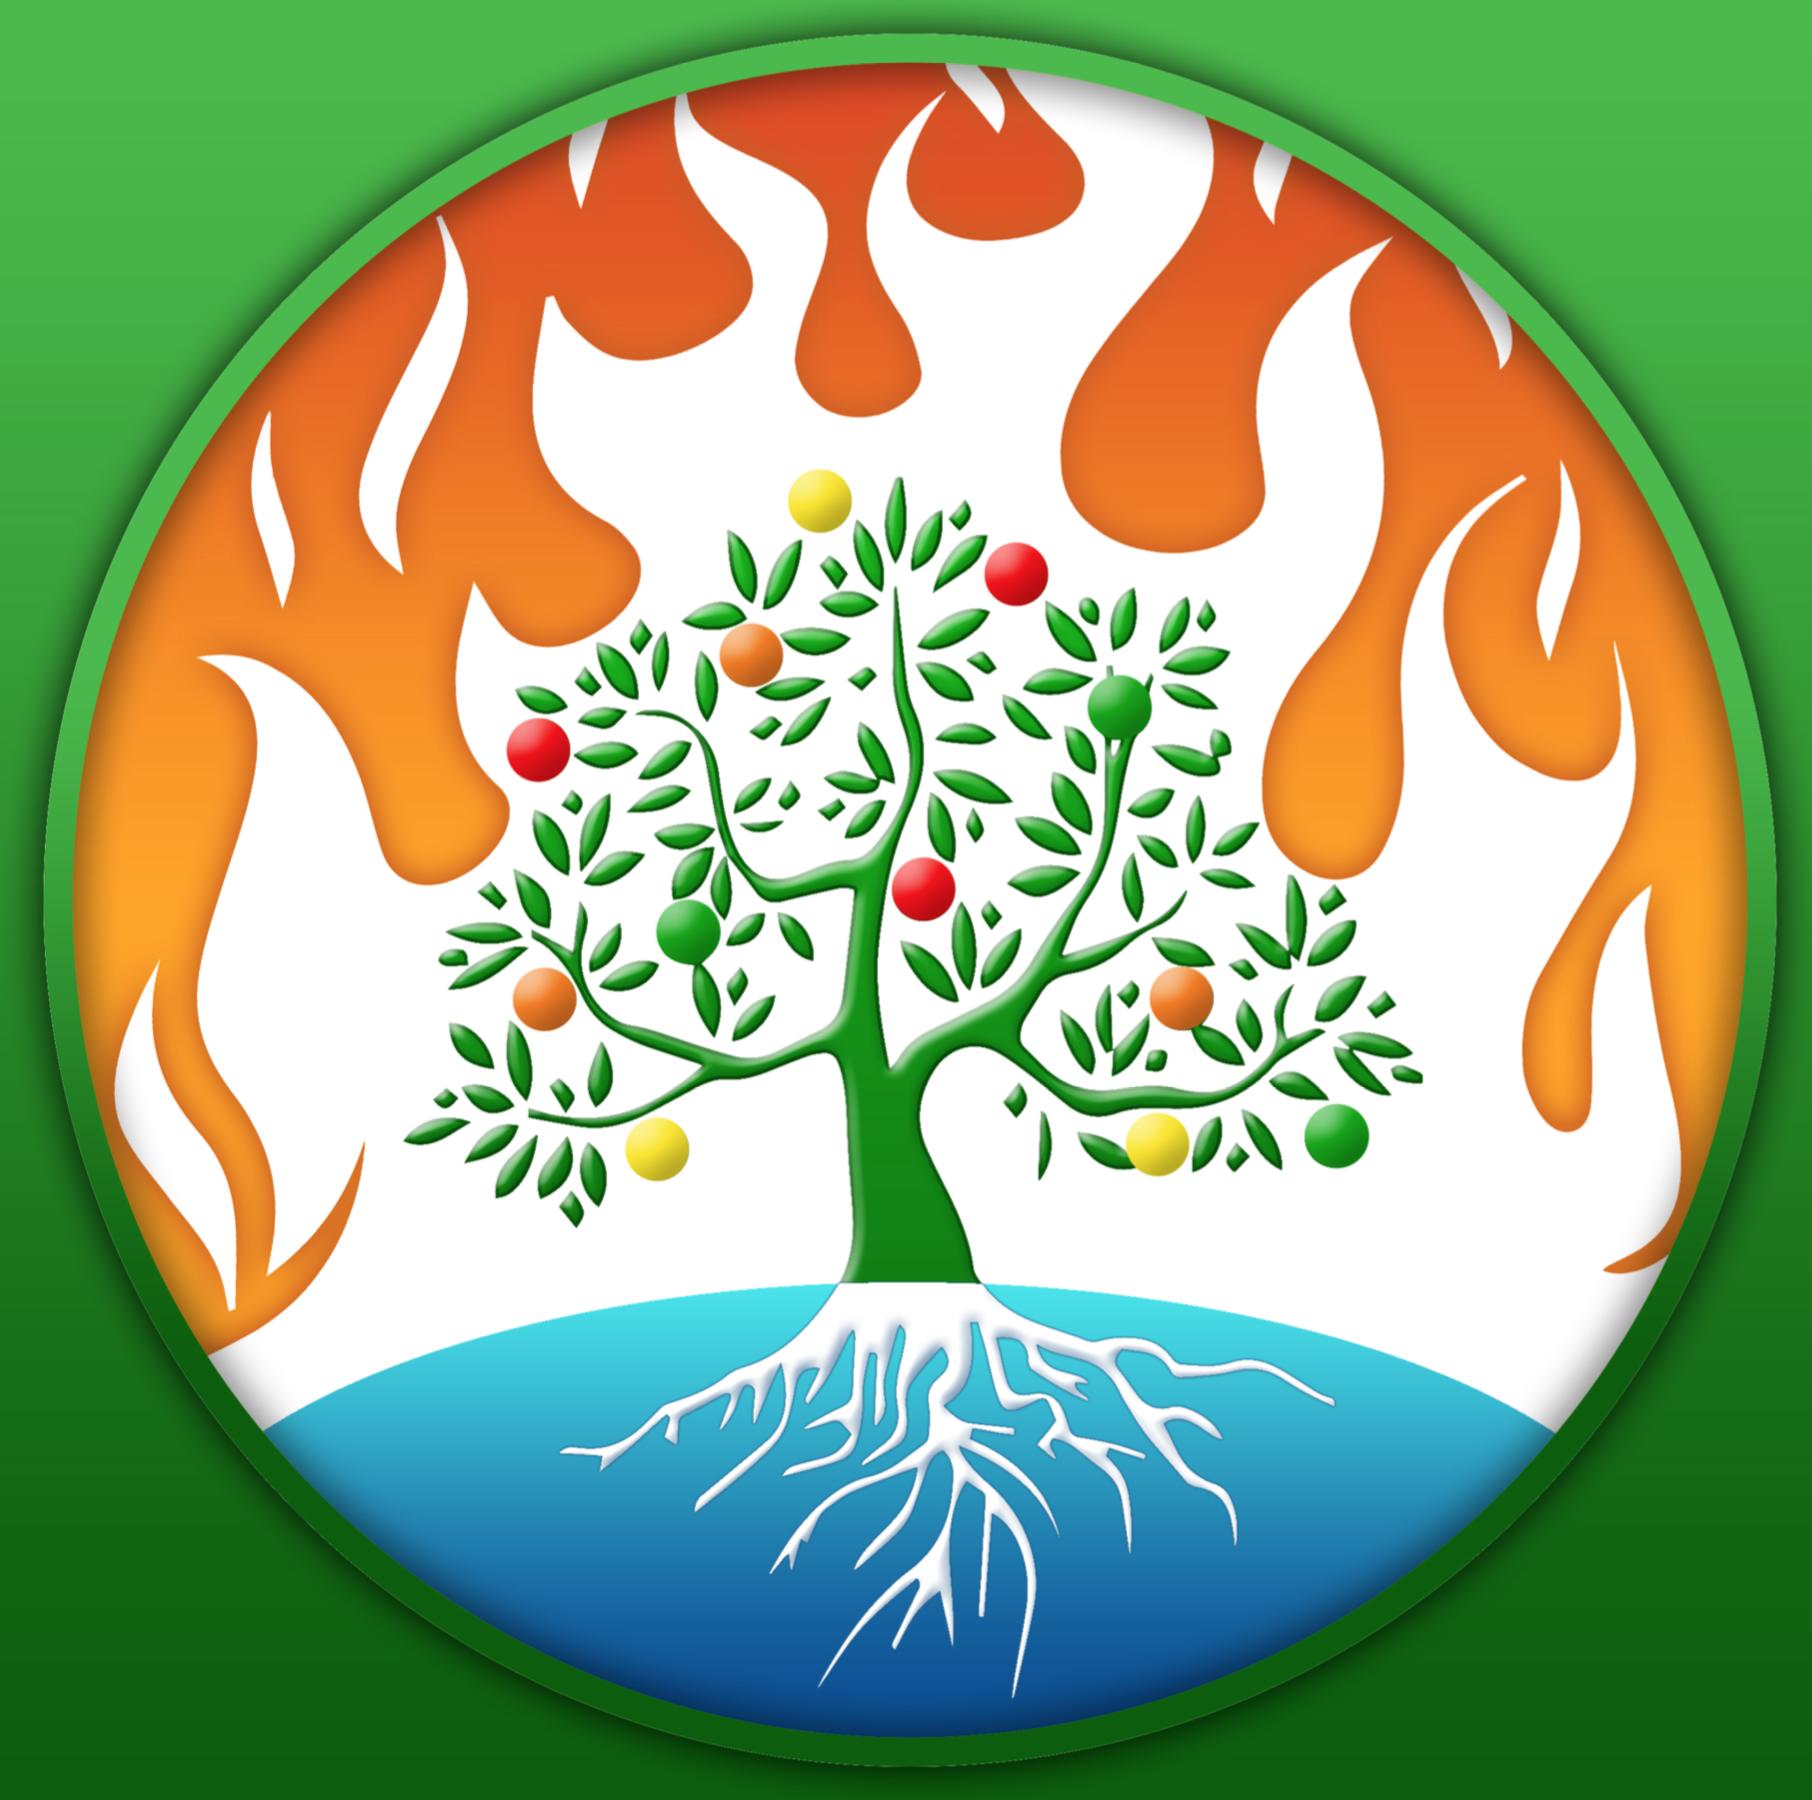 blazing trees